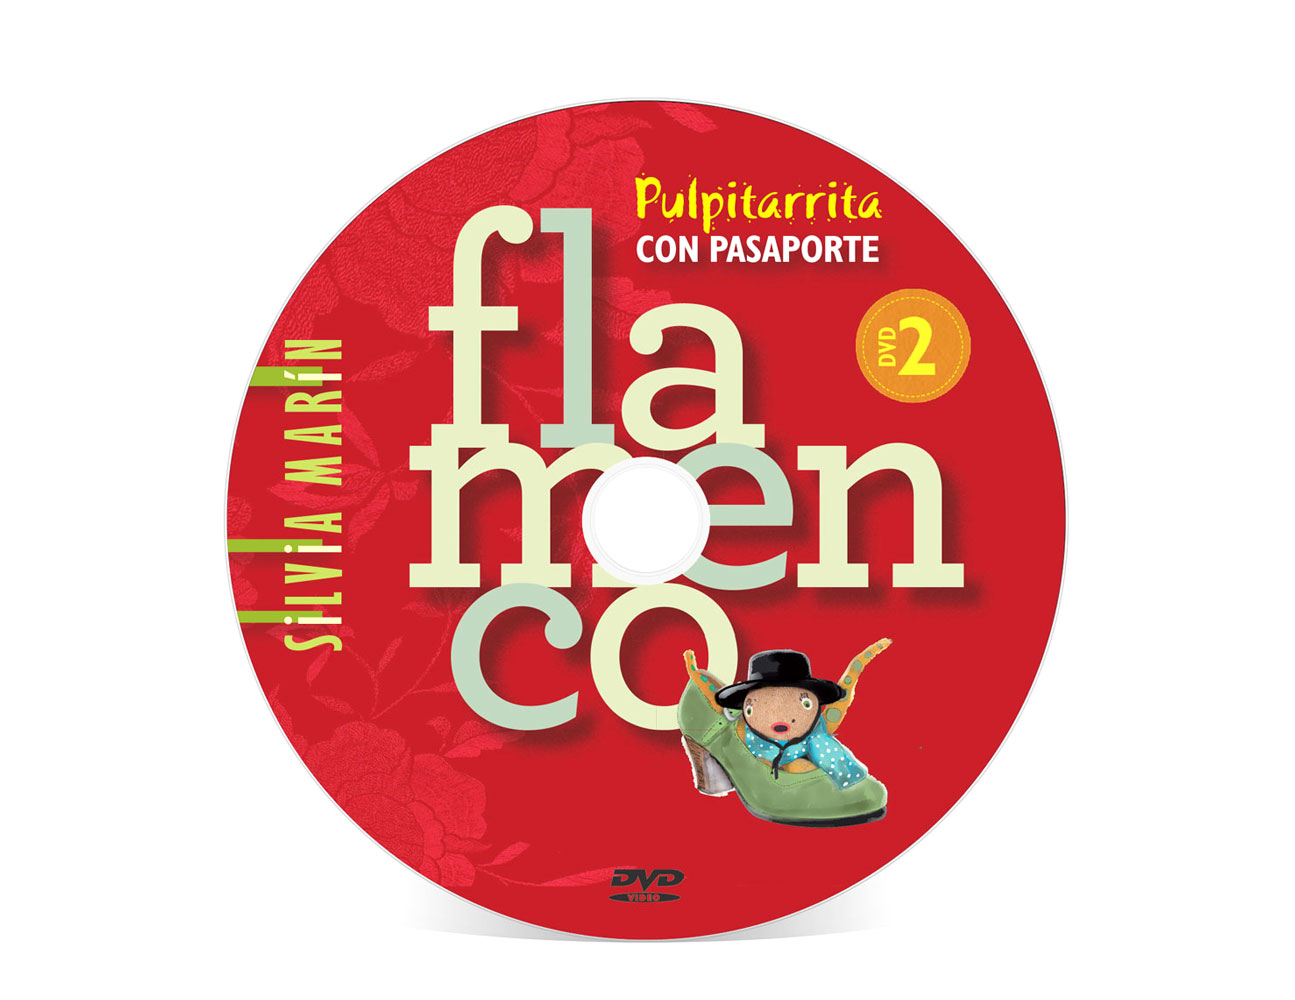 DVD 2 Pulpitarrita con pasaporte flamenco